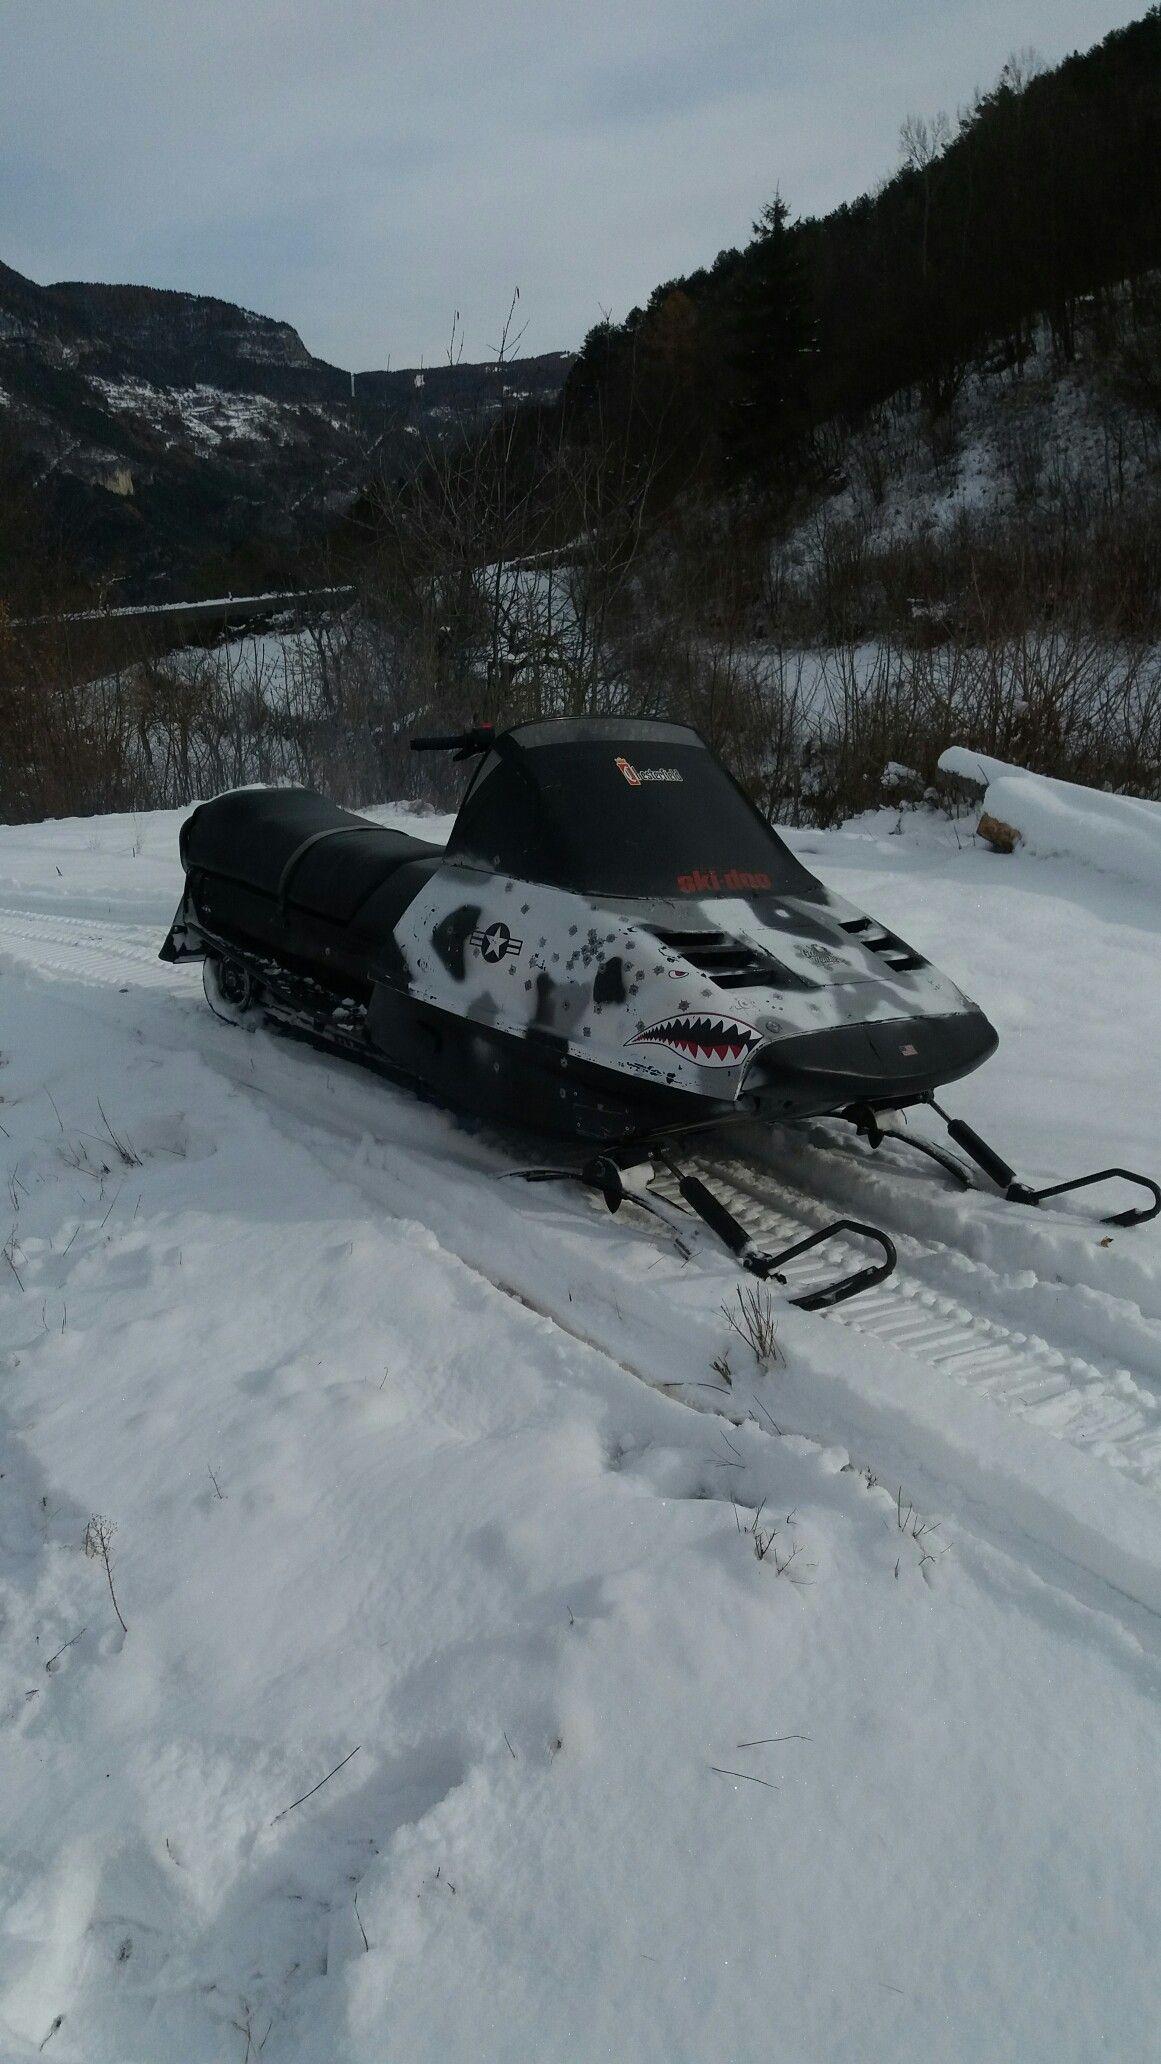 Ski Doo Safari 447 Motoslitta